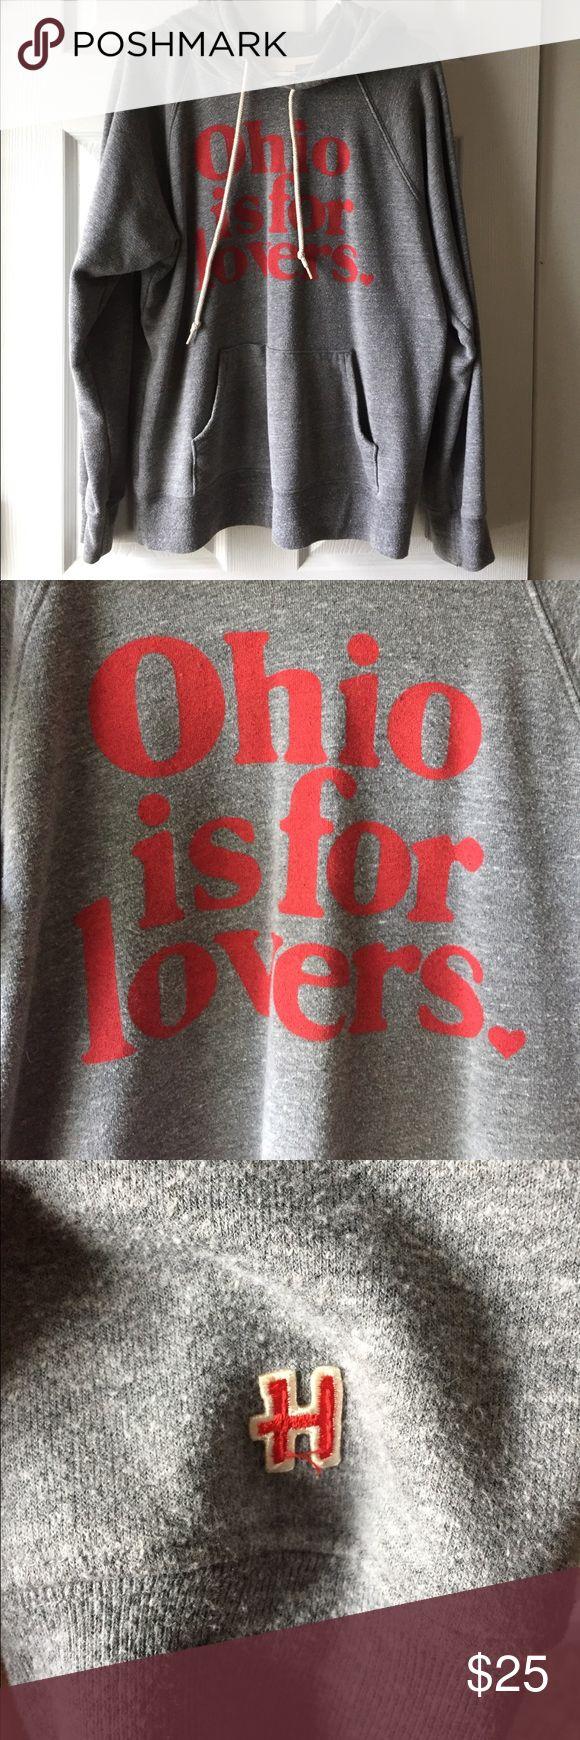 Homage Ohio Is For Lovers Hoodie Homage Ohio Is For Lovers Hoodie, size M. Front pocket. Homage Tops Sweatshirts & Hoodies